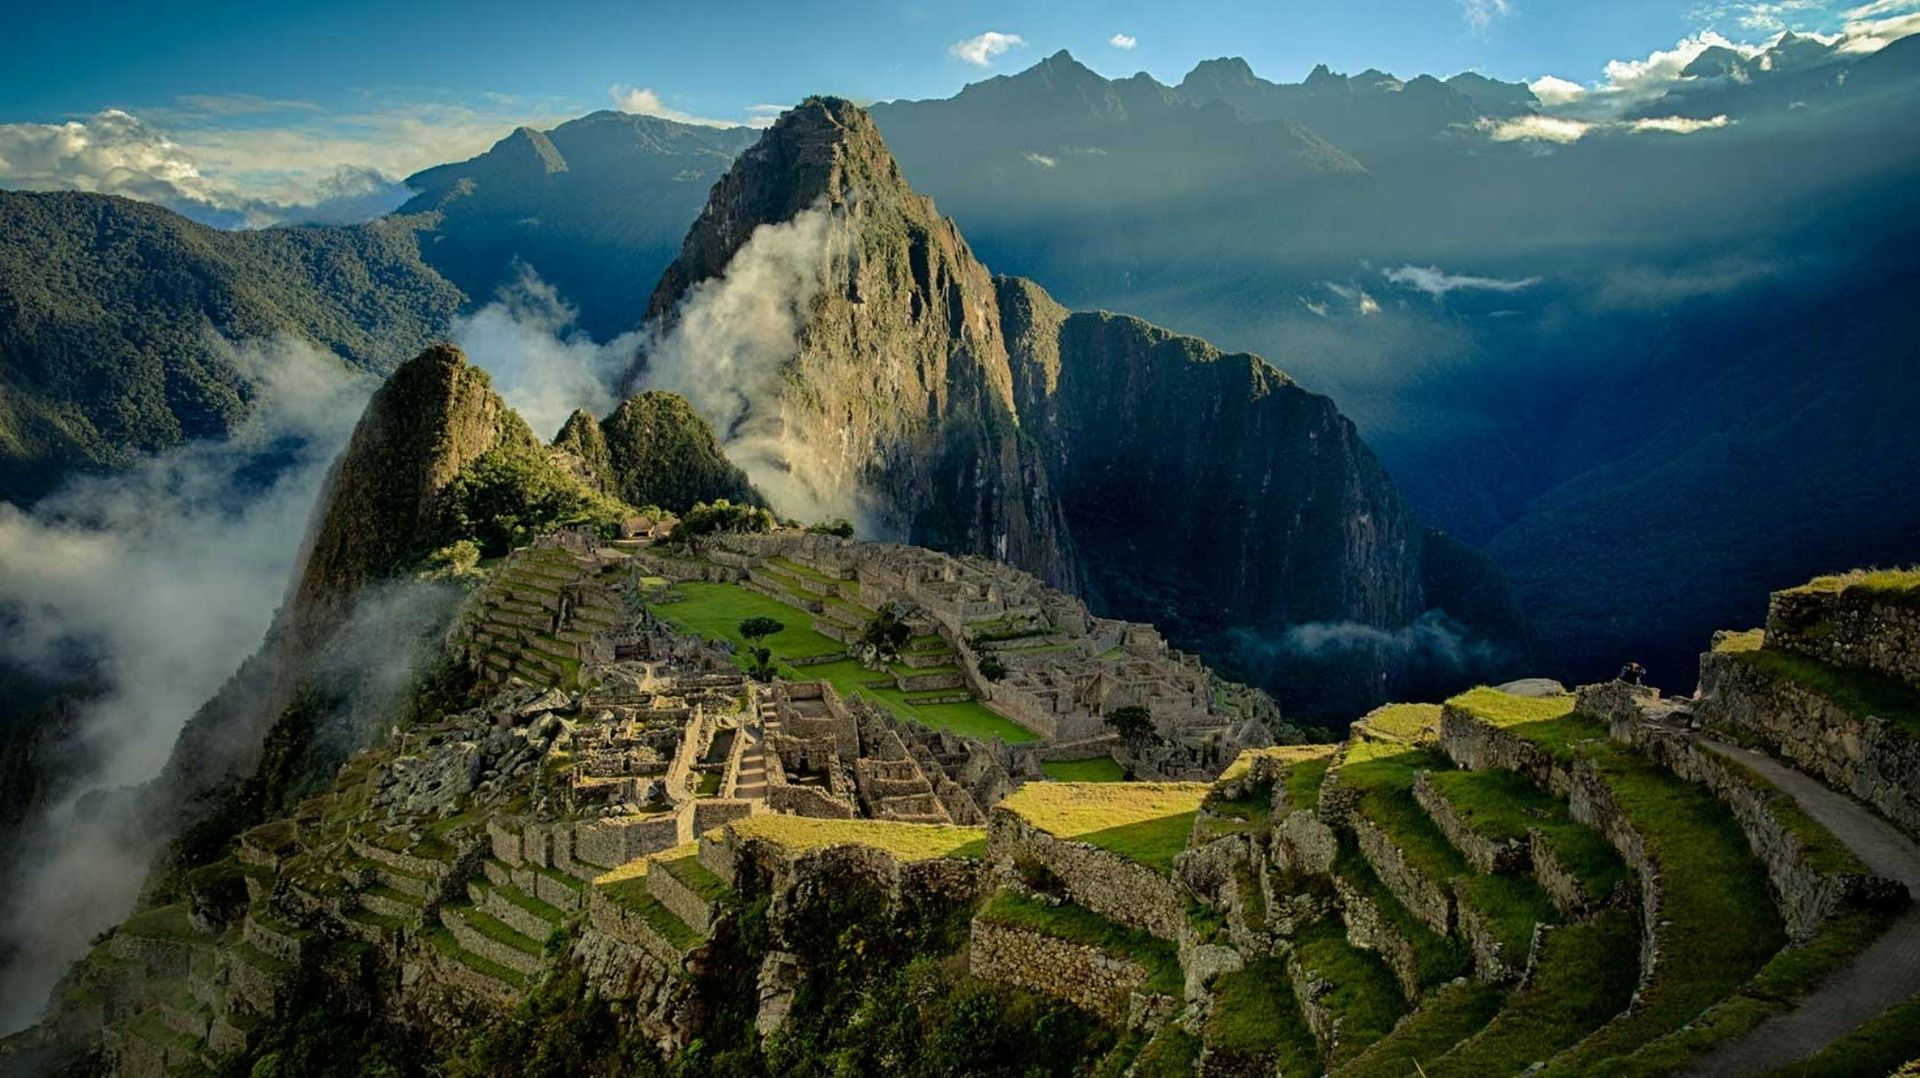 Machu Picchu Peru Desktop PC And Mac Wallpaper 1920x1078 Wallpapers 10